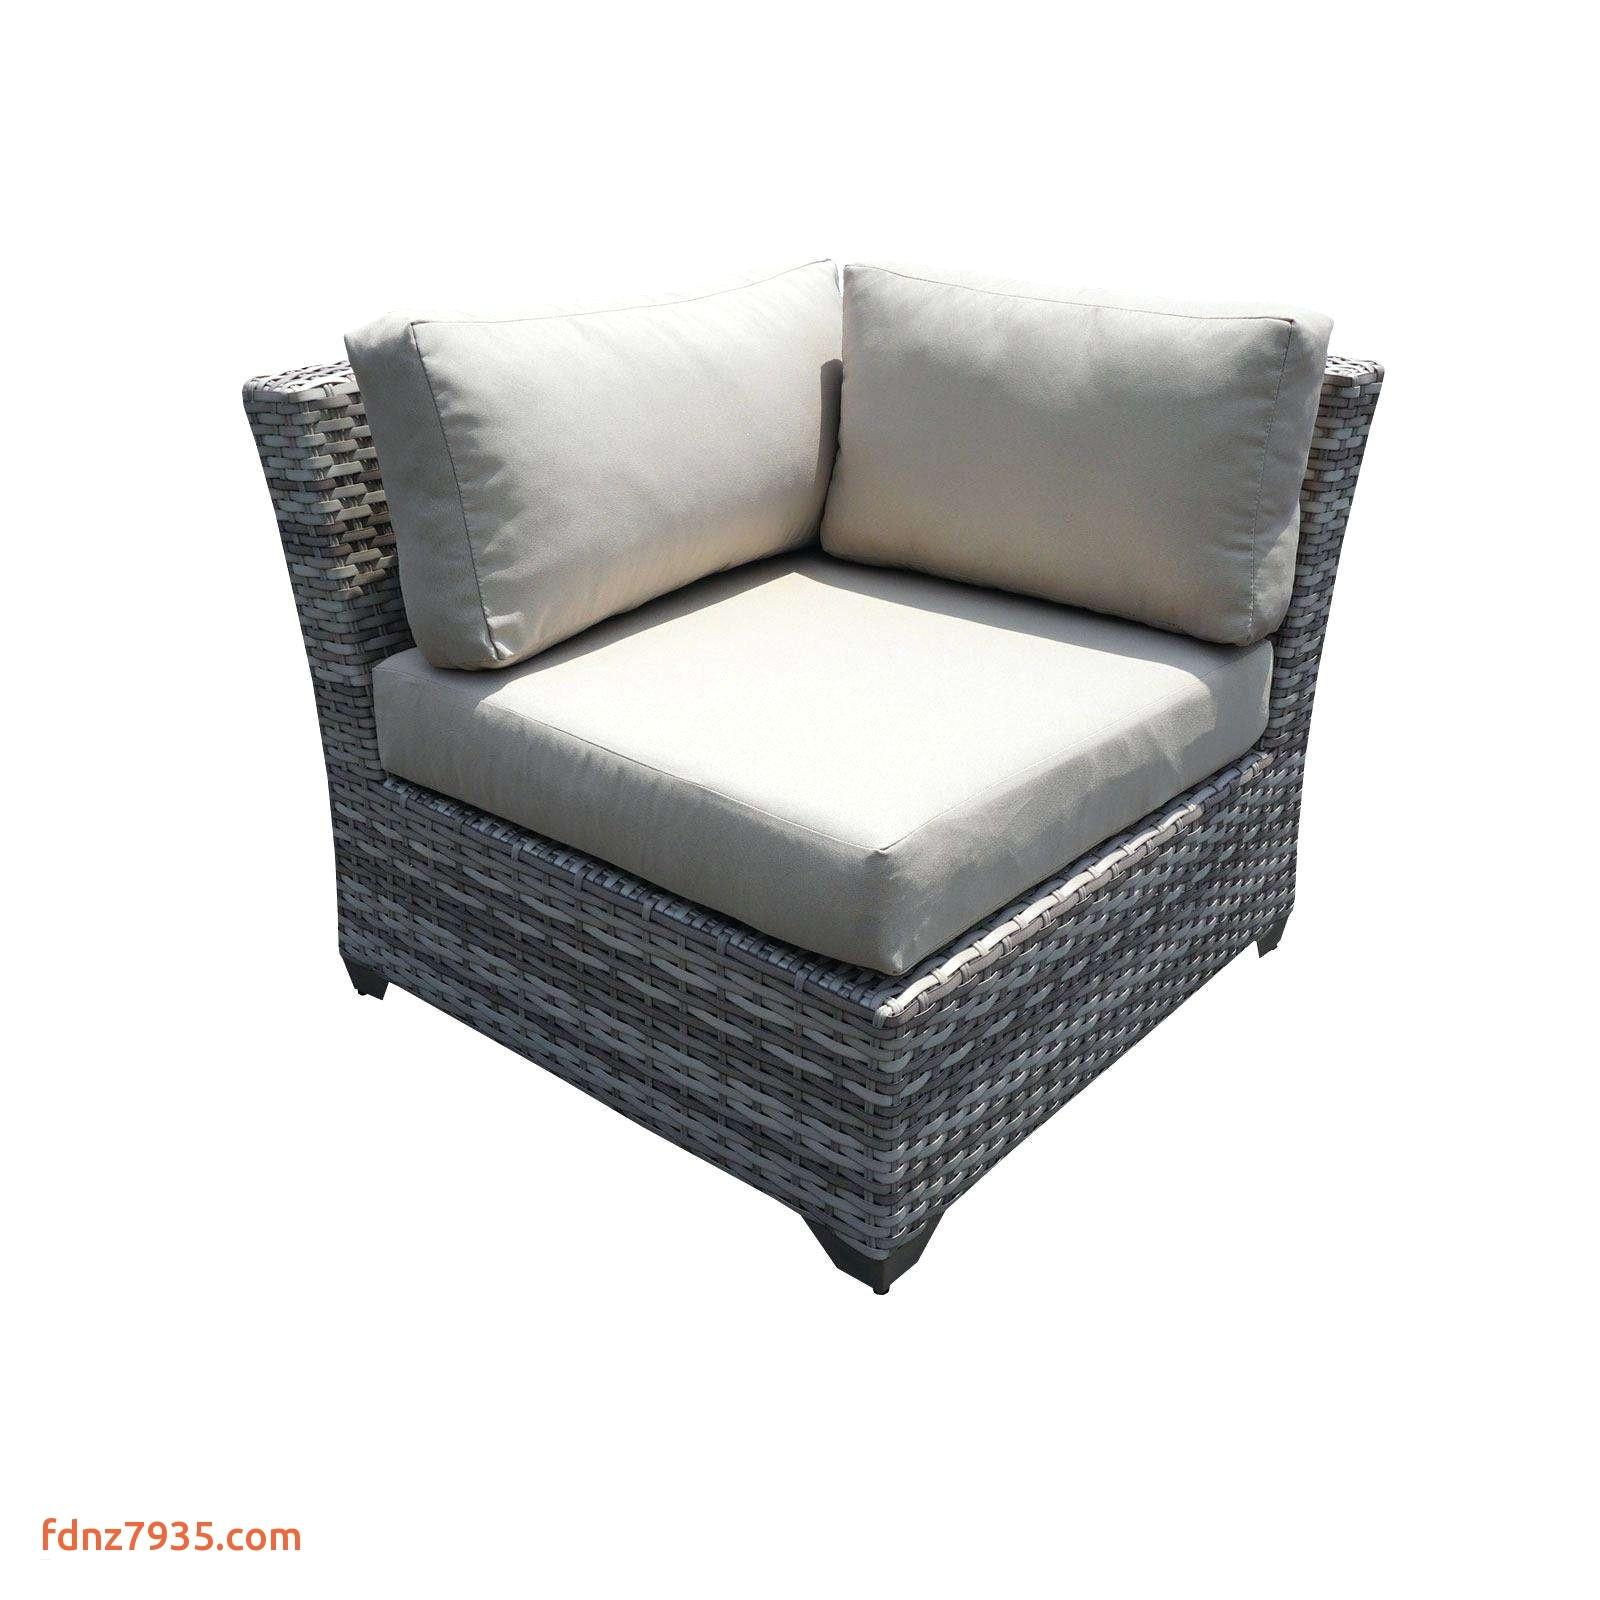 walmart patio cushions replacements luxury patio furniture cushions walmart nice wicker outdoor sofa 0d patio